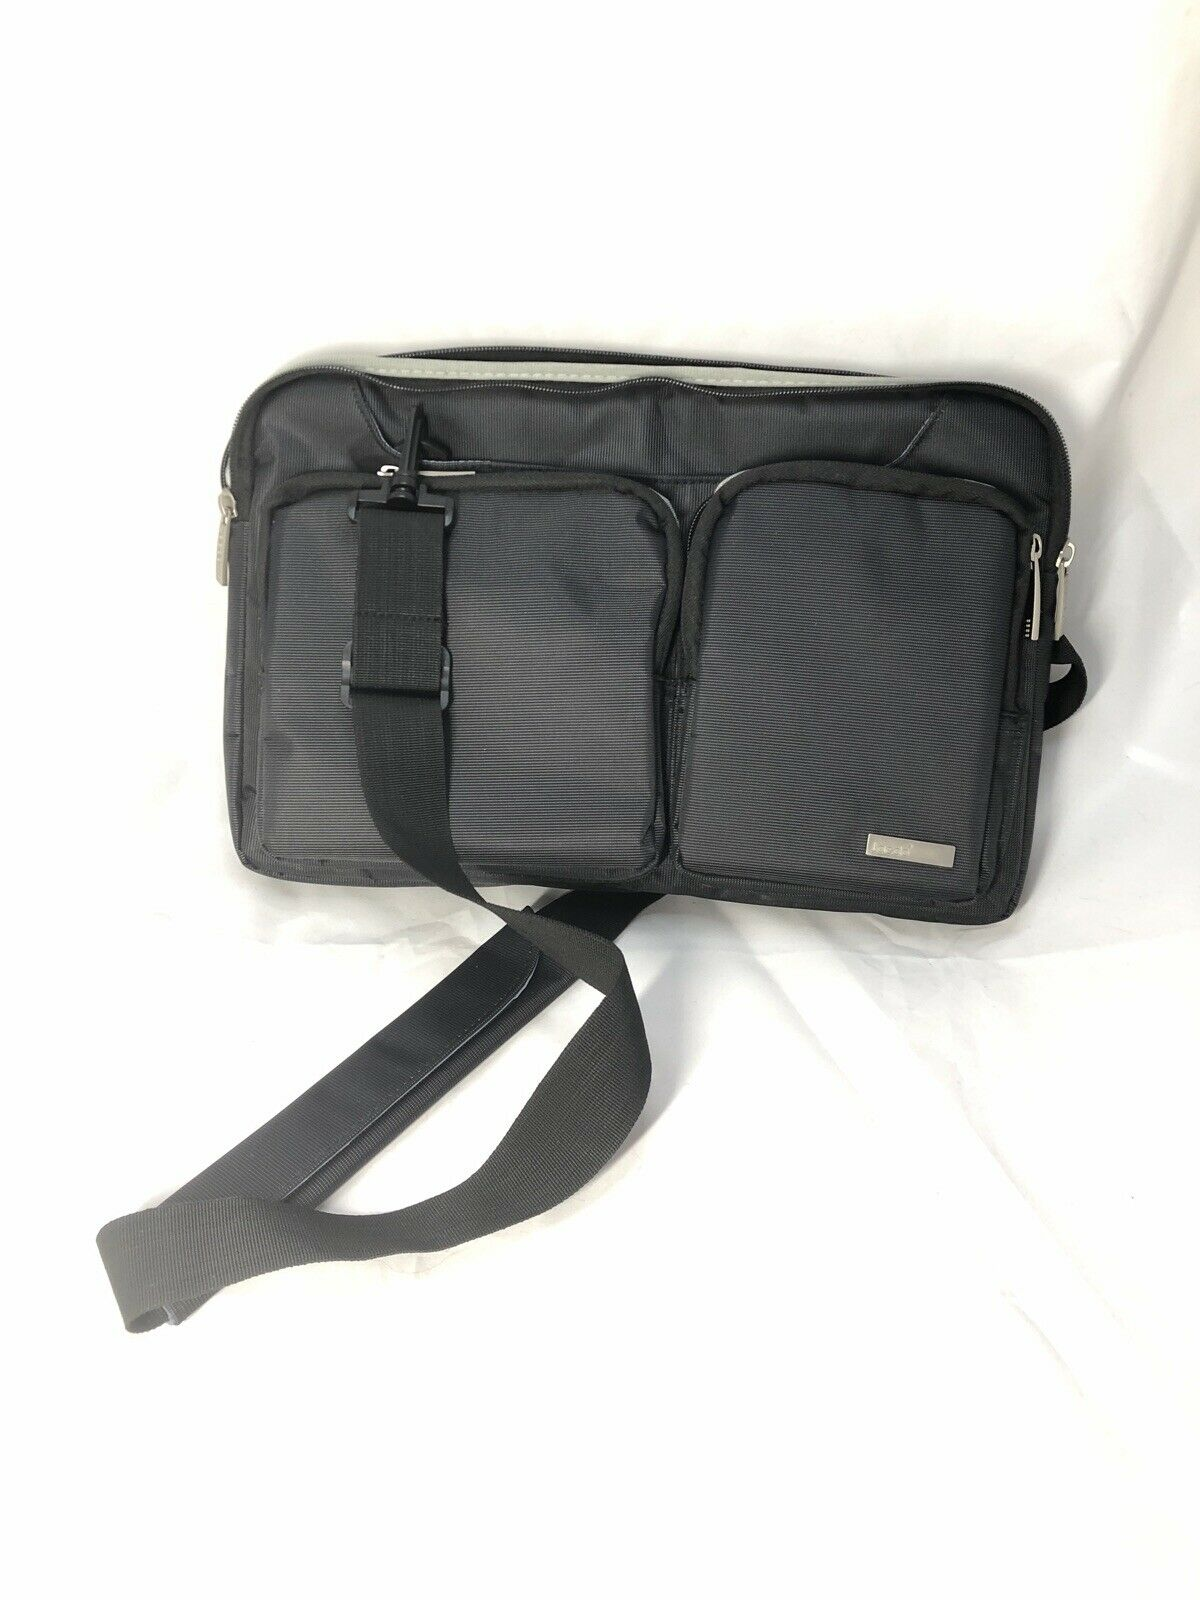 360/° Protective Sleeve Case for 15.6 Inch Acer Aspire 5 HP Pavilion Lacdo 15.6 Inch Laptop Messenger Shoulder Bag Black Ideapad 330 7 E 15 ASUS Notebook Flagship Predator Helios 300 Inspiron